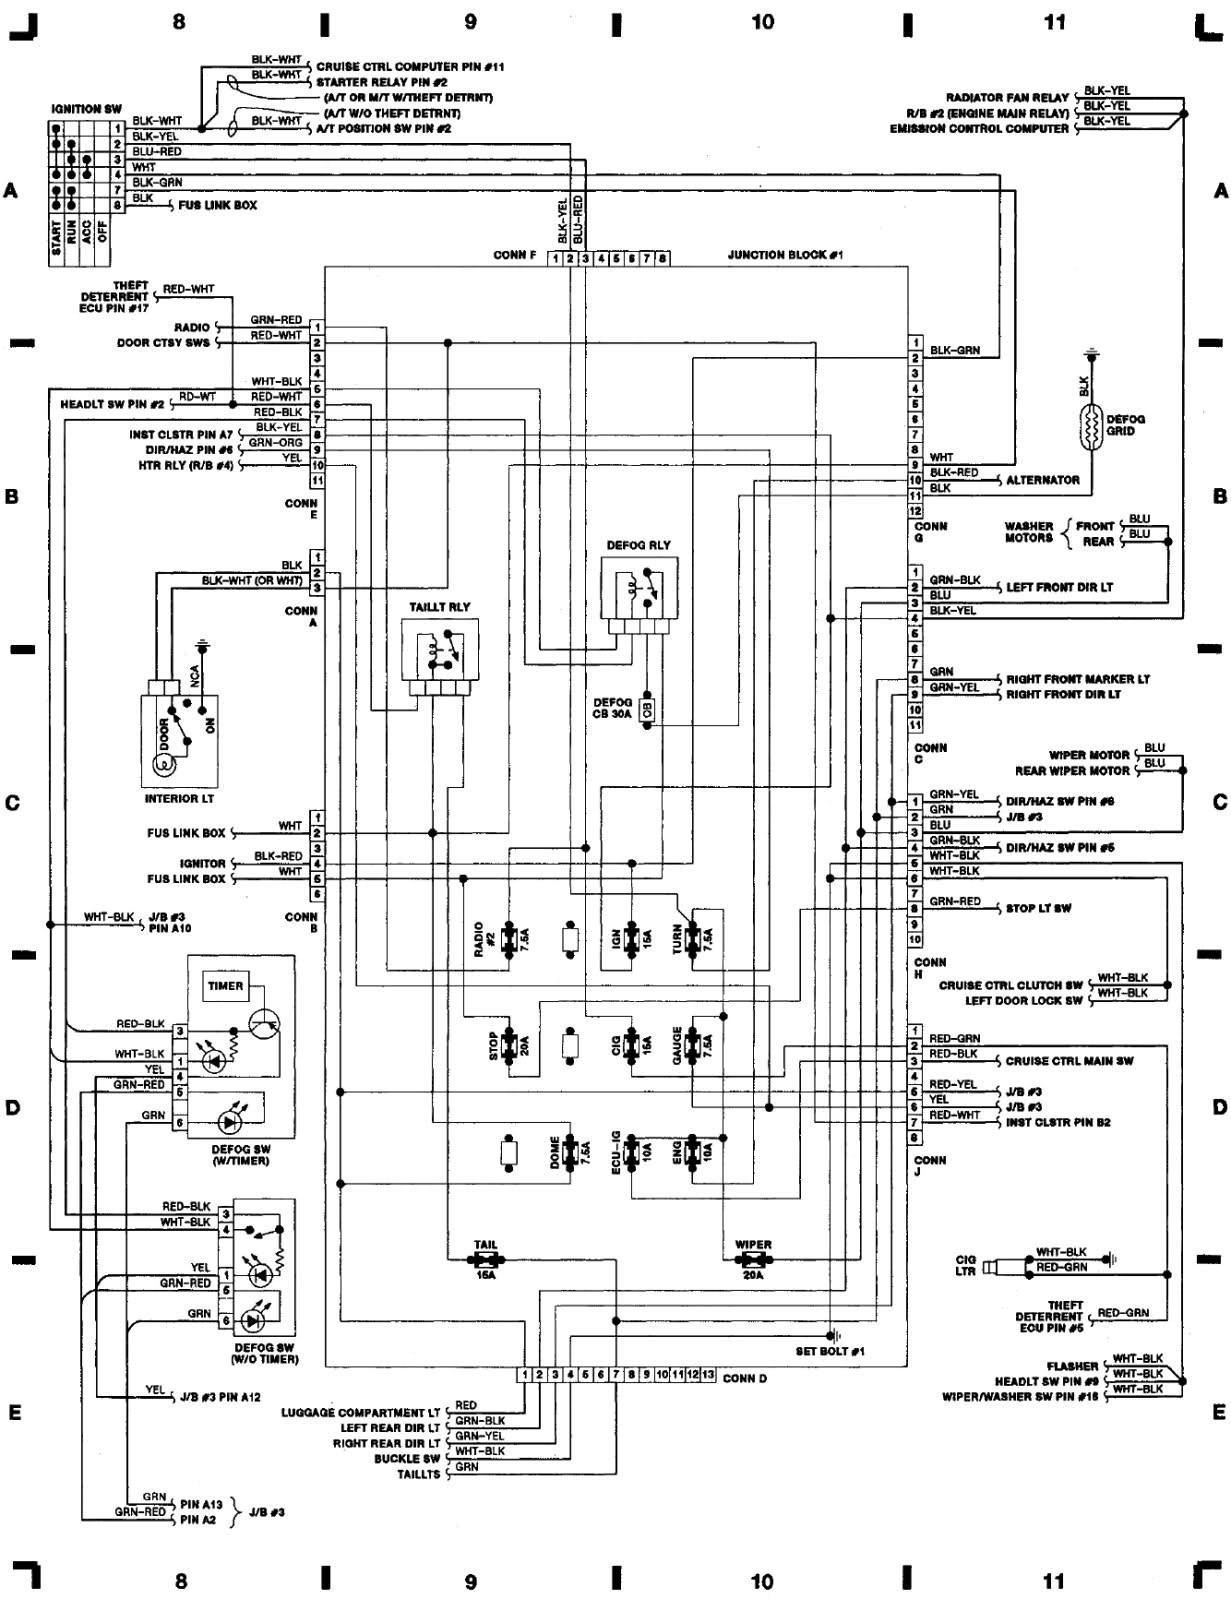 Toyota 1nz Fe Engine Wiring Diagram Wiring Diagram toyota Great Corolla Save Wiring Diagram Great Of Toyota 1nz Fe Engine Wiring Diagram